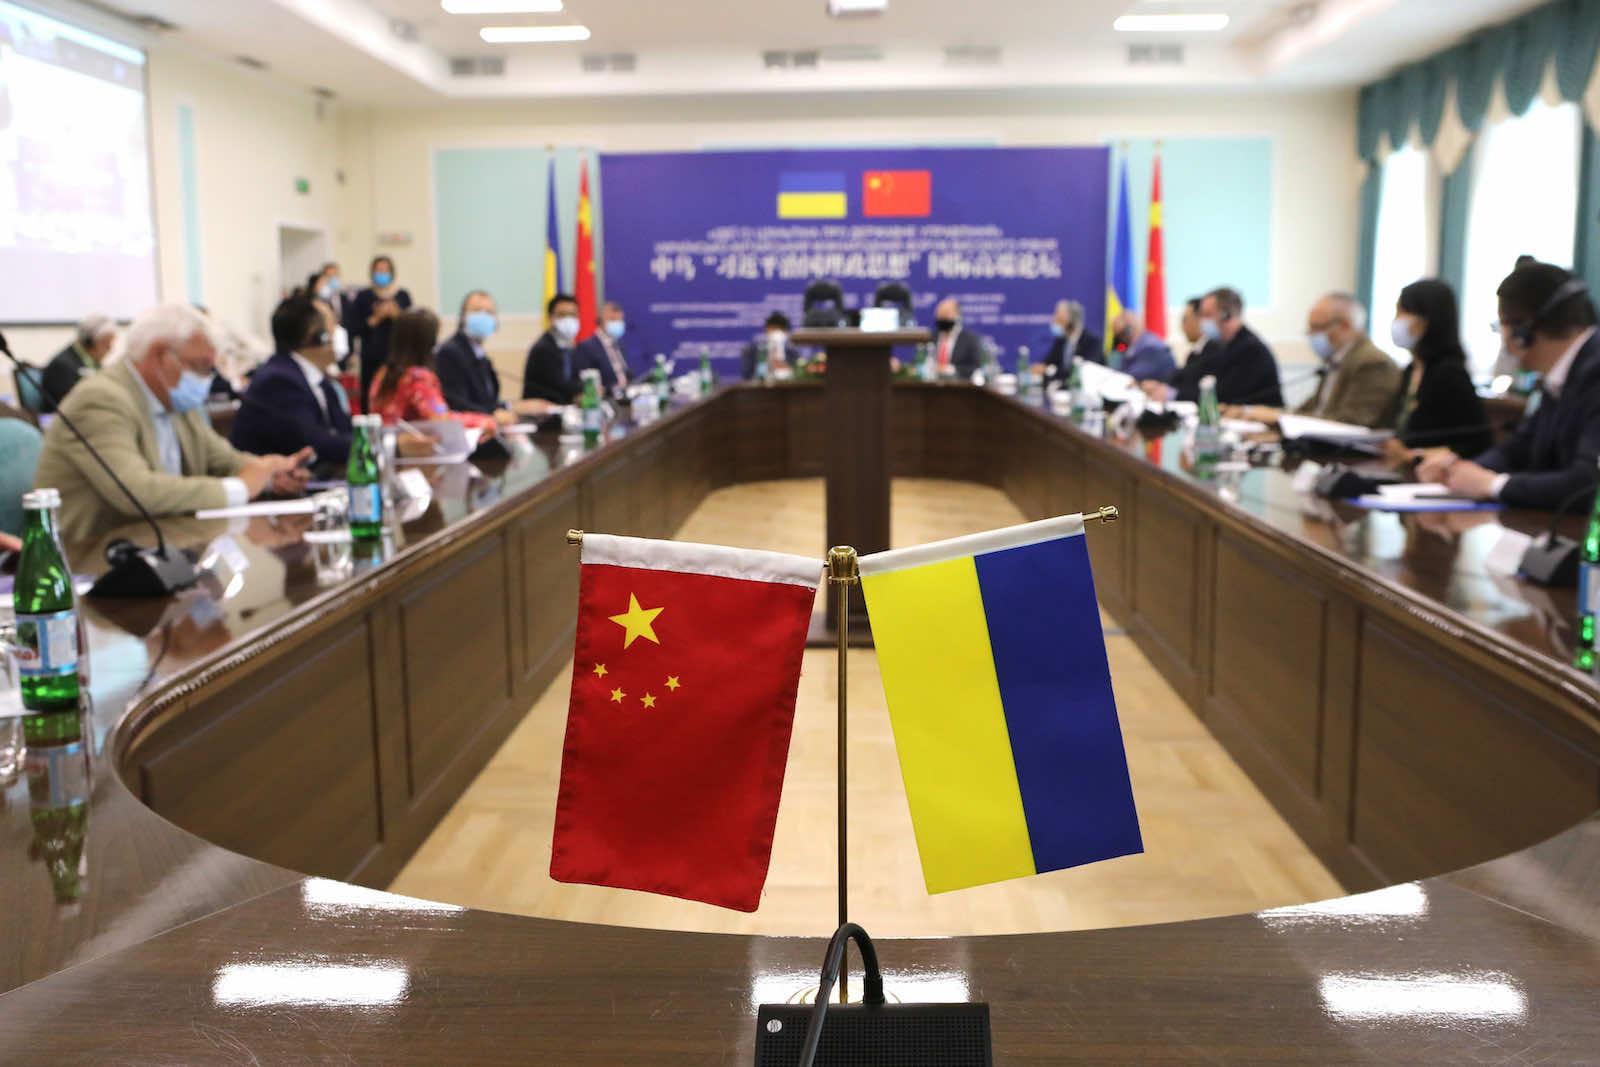 The International Ukrainian-Chinese Forum at the Borys Grinchenko Kiev University in June (Yuliia Ovsiannikova/Ukrinform/Barcroft Media via Getty Images)